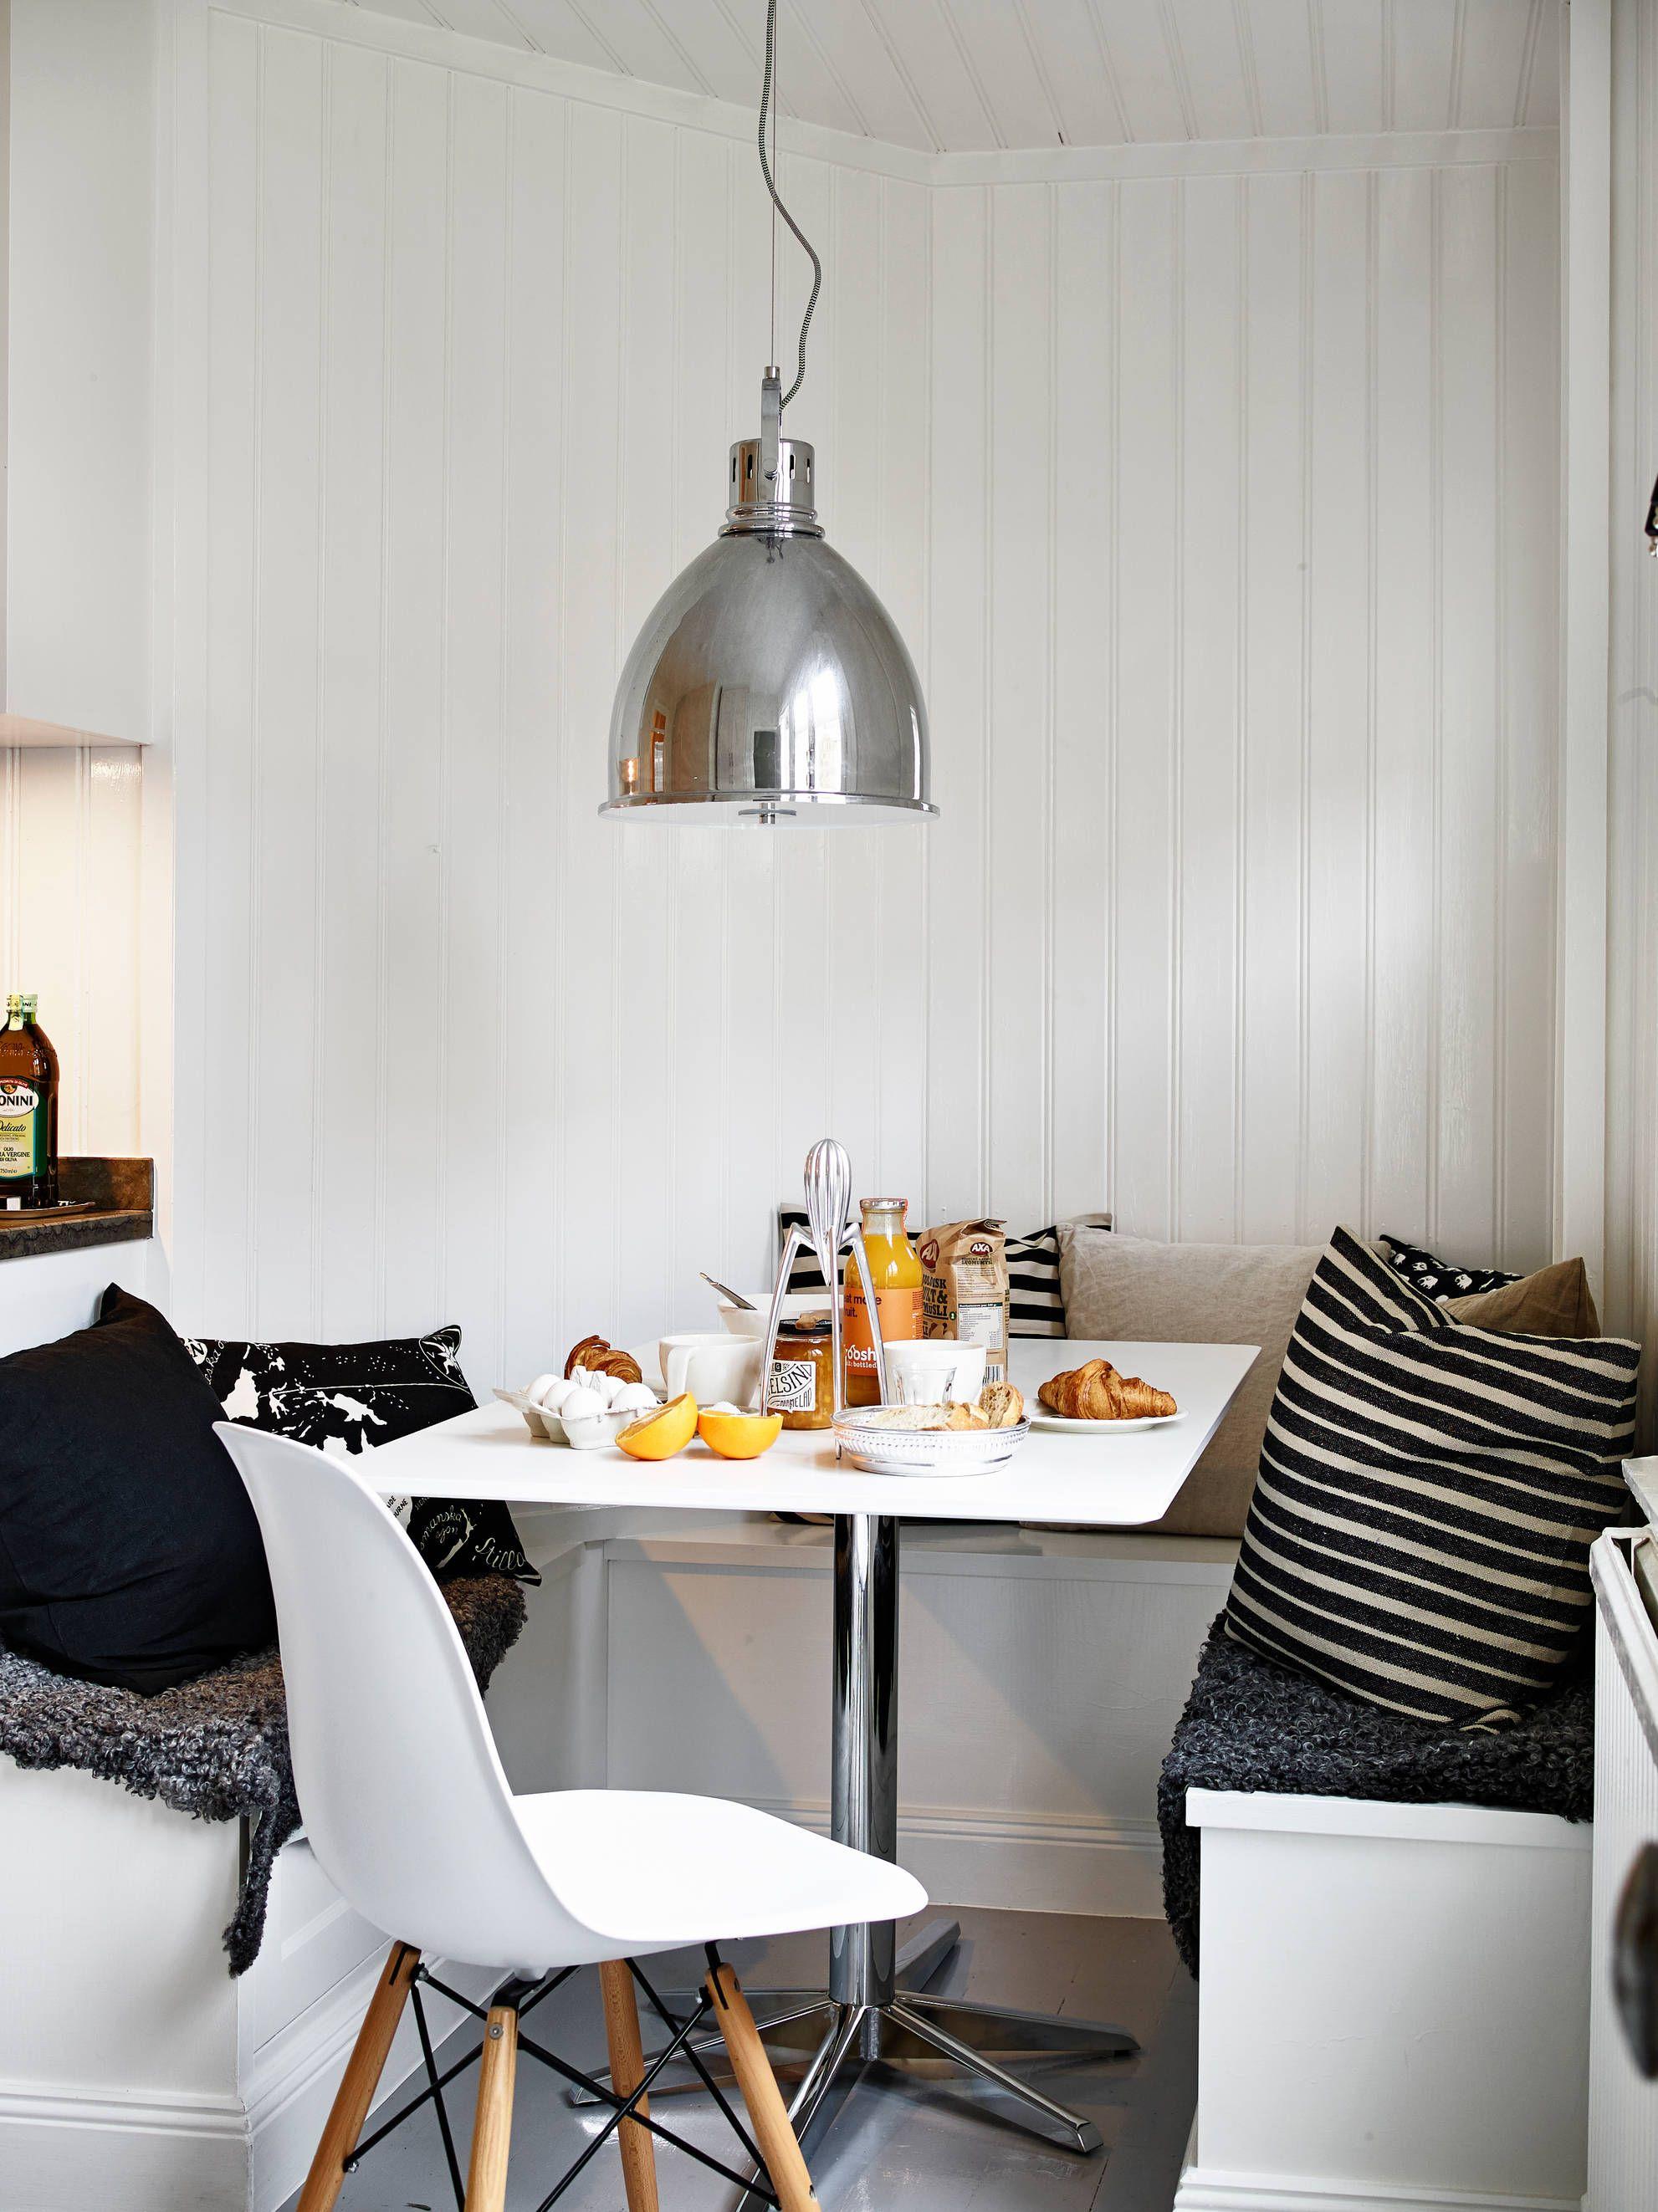 Classic and mid-century modern combined into a cozy Swedish home » COCO LAPINE DESIGNCOCO LAPINE DESIGN